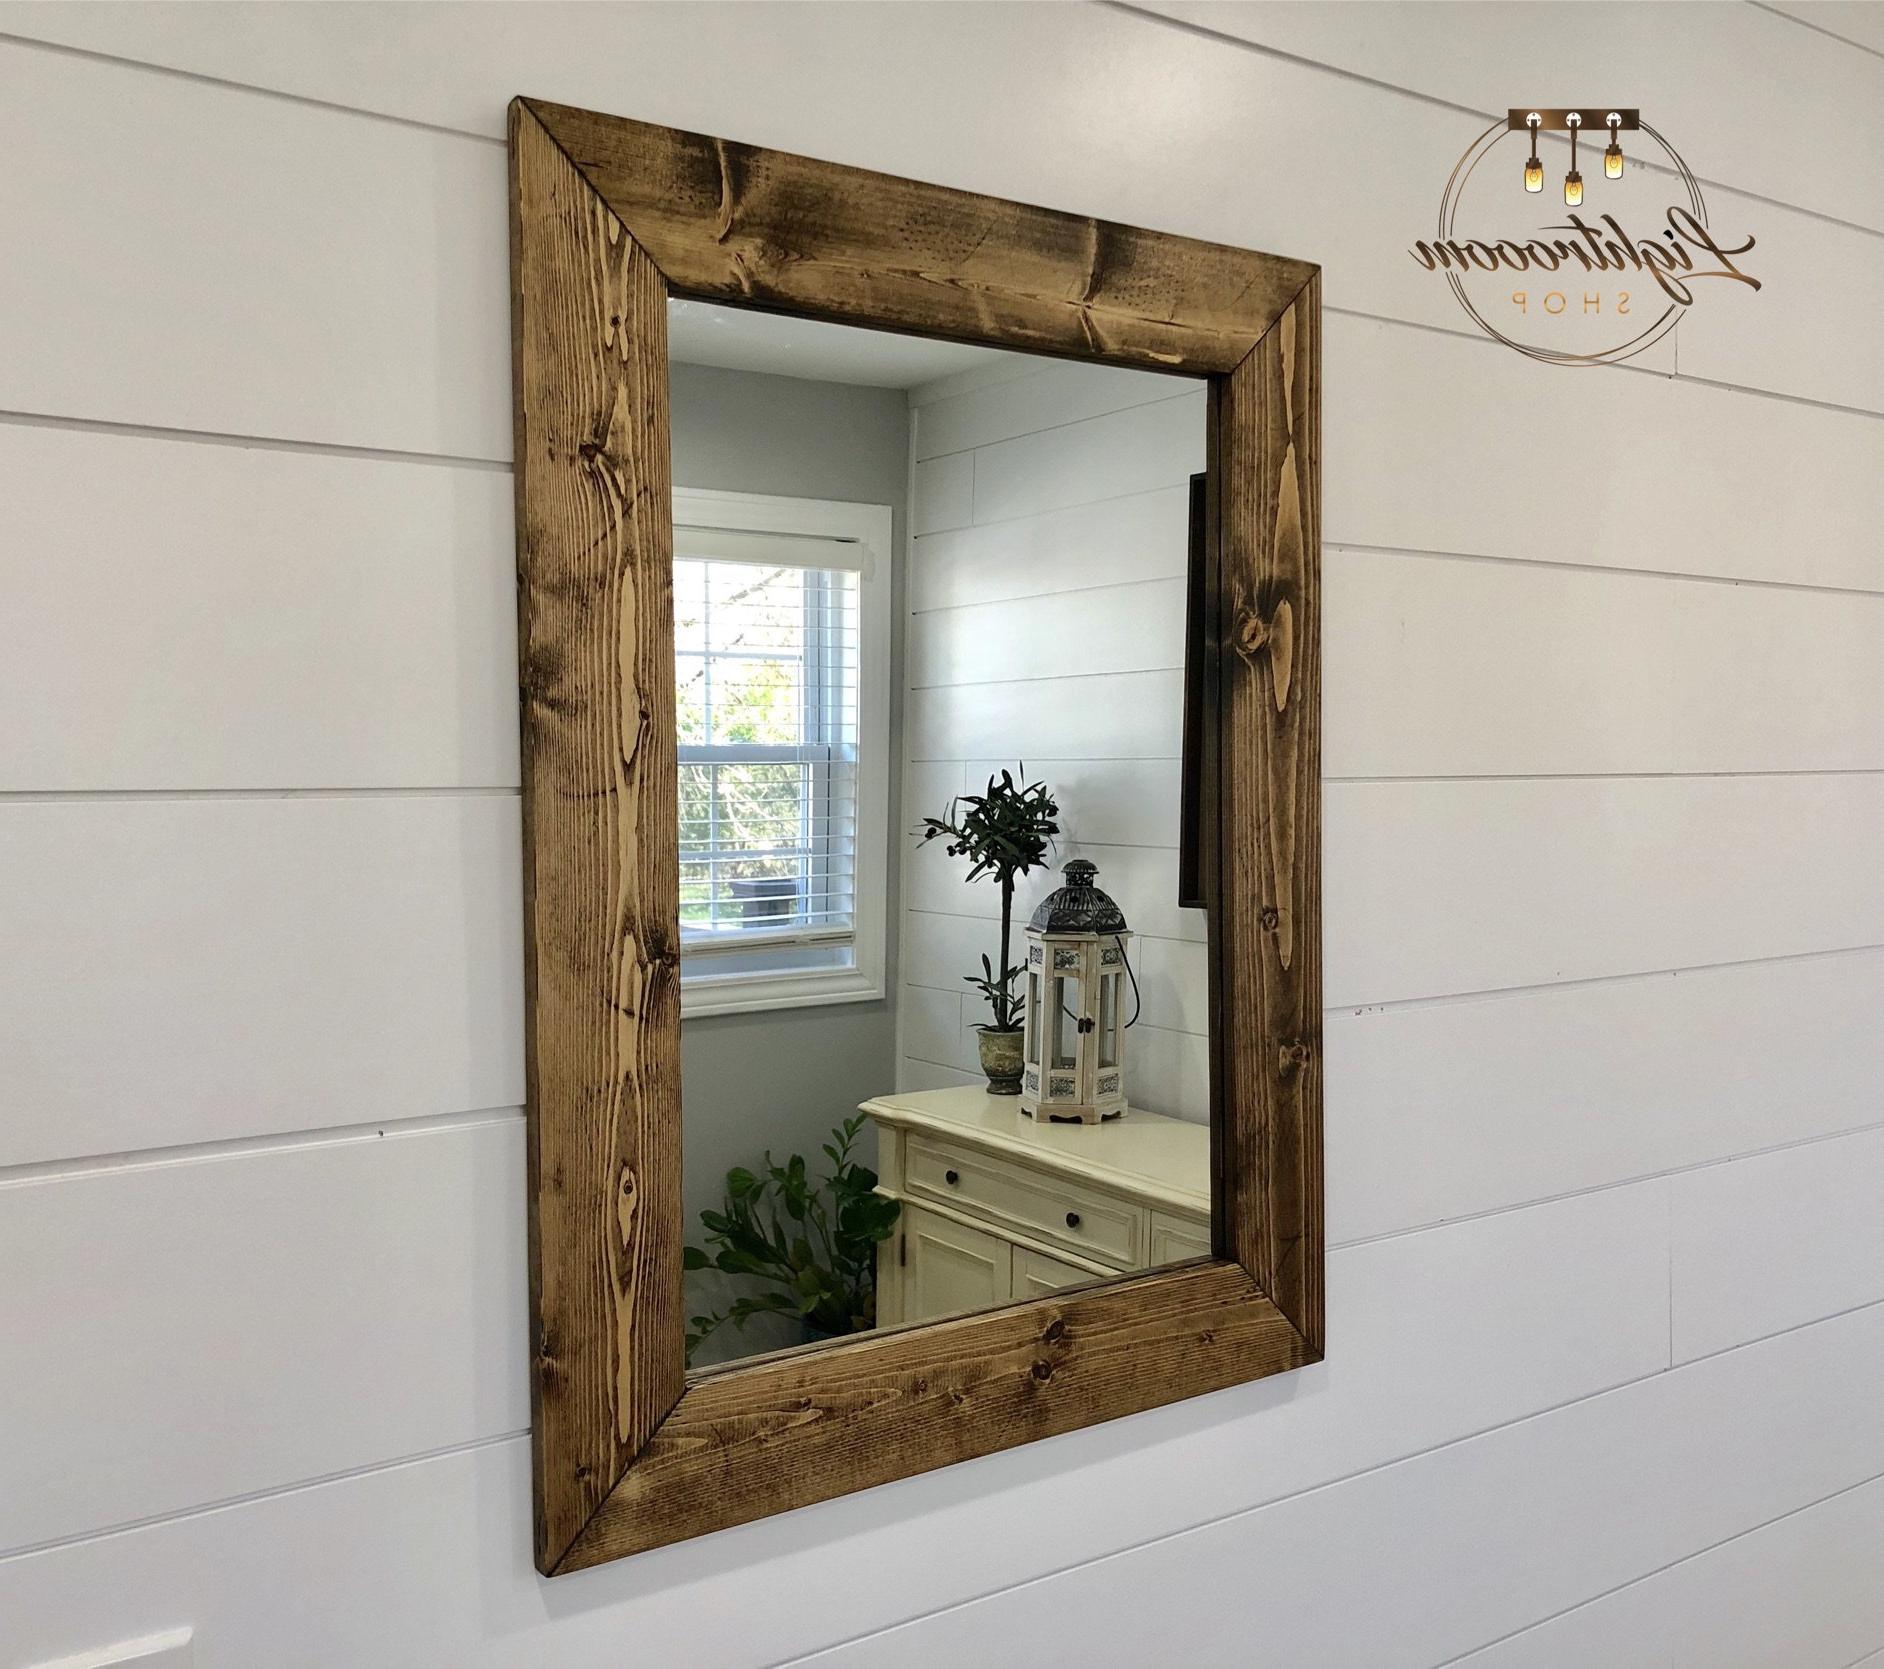 Dark Walnut Mirror, Wood Frame Mirror, Handmade Rustic Wood Mirror, Bathroom Mirror, Framed Wall Mirror, Vanity Mirror, Large Mirror, Modern In Latest Framed Wall Mirrors (View 20 of 20)